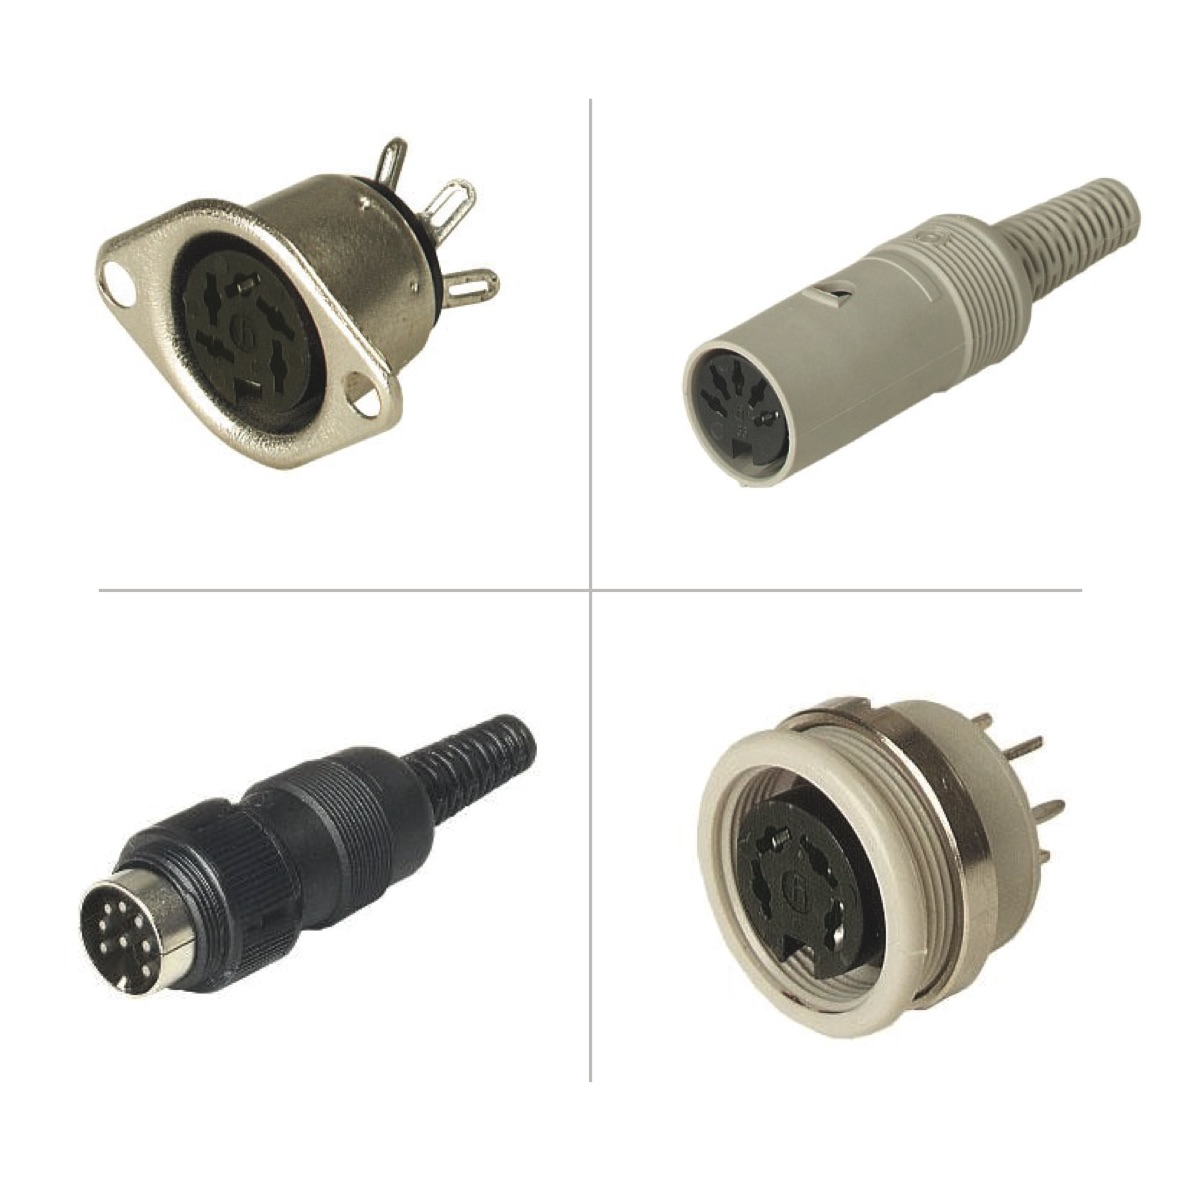 Hirschmann MAS/MAK Connectors (DIN EN 60130-9)